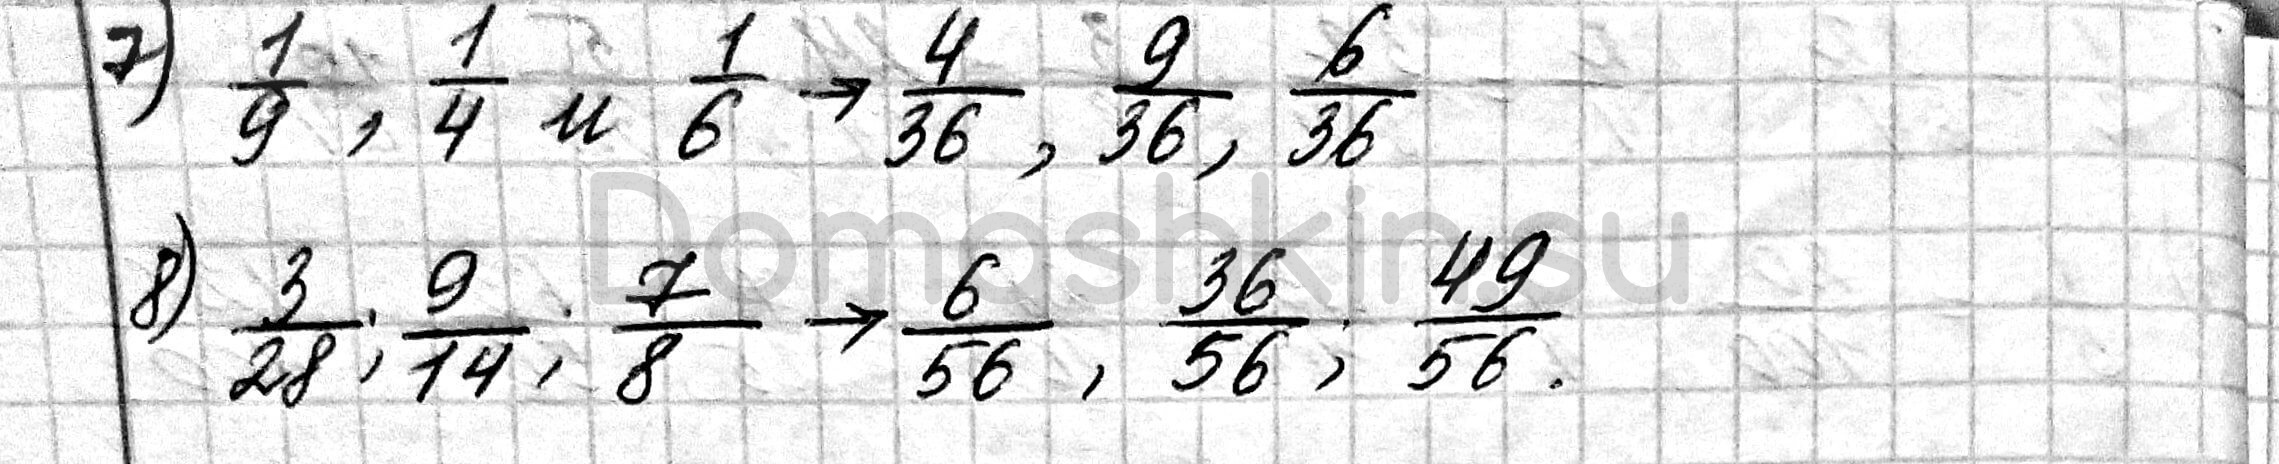 Математика 6 класс учебник Мерзляк номер 240 решение